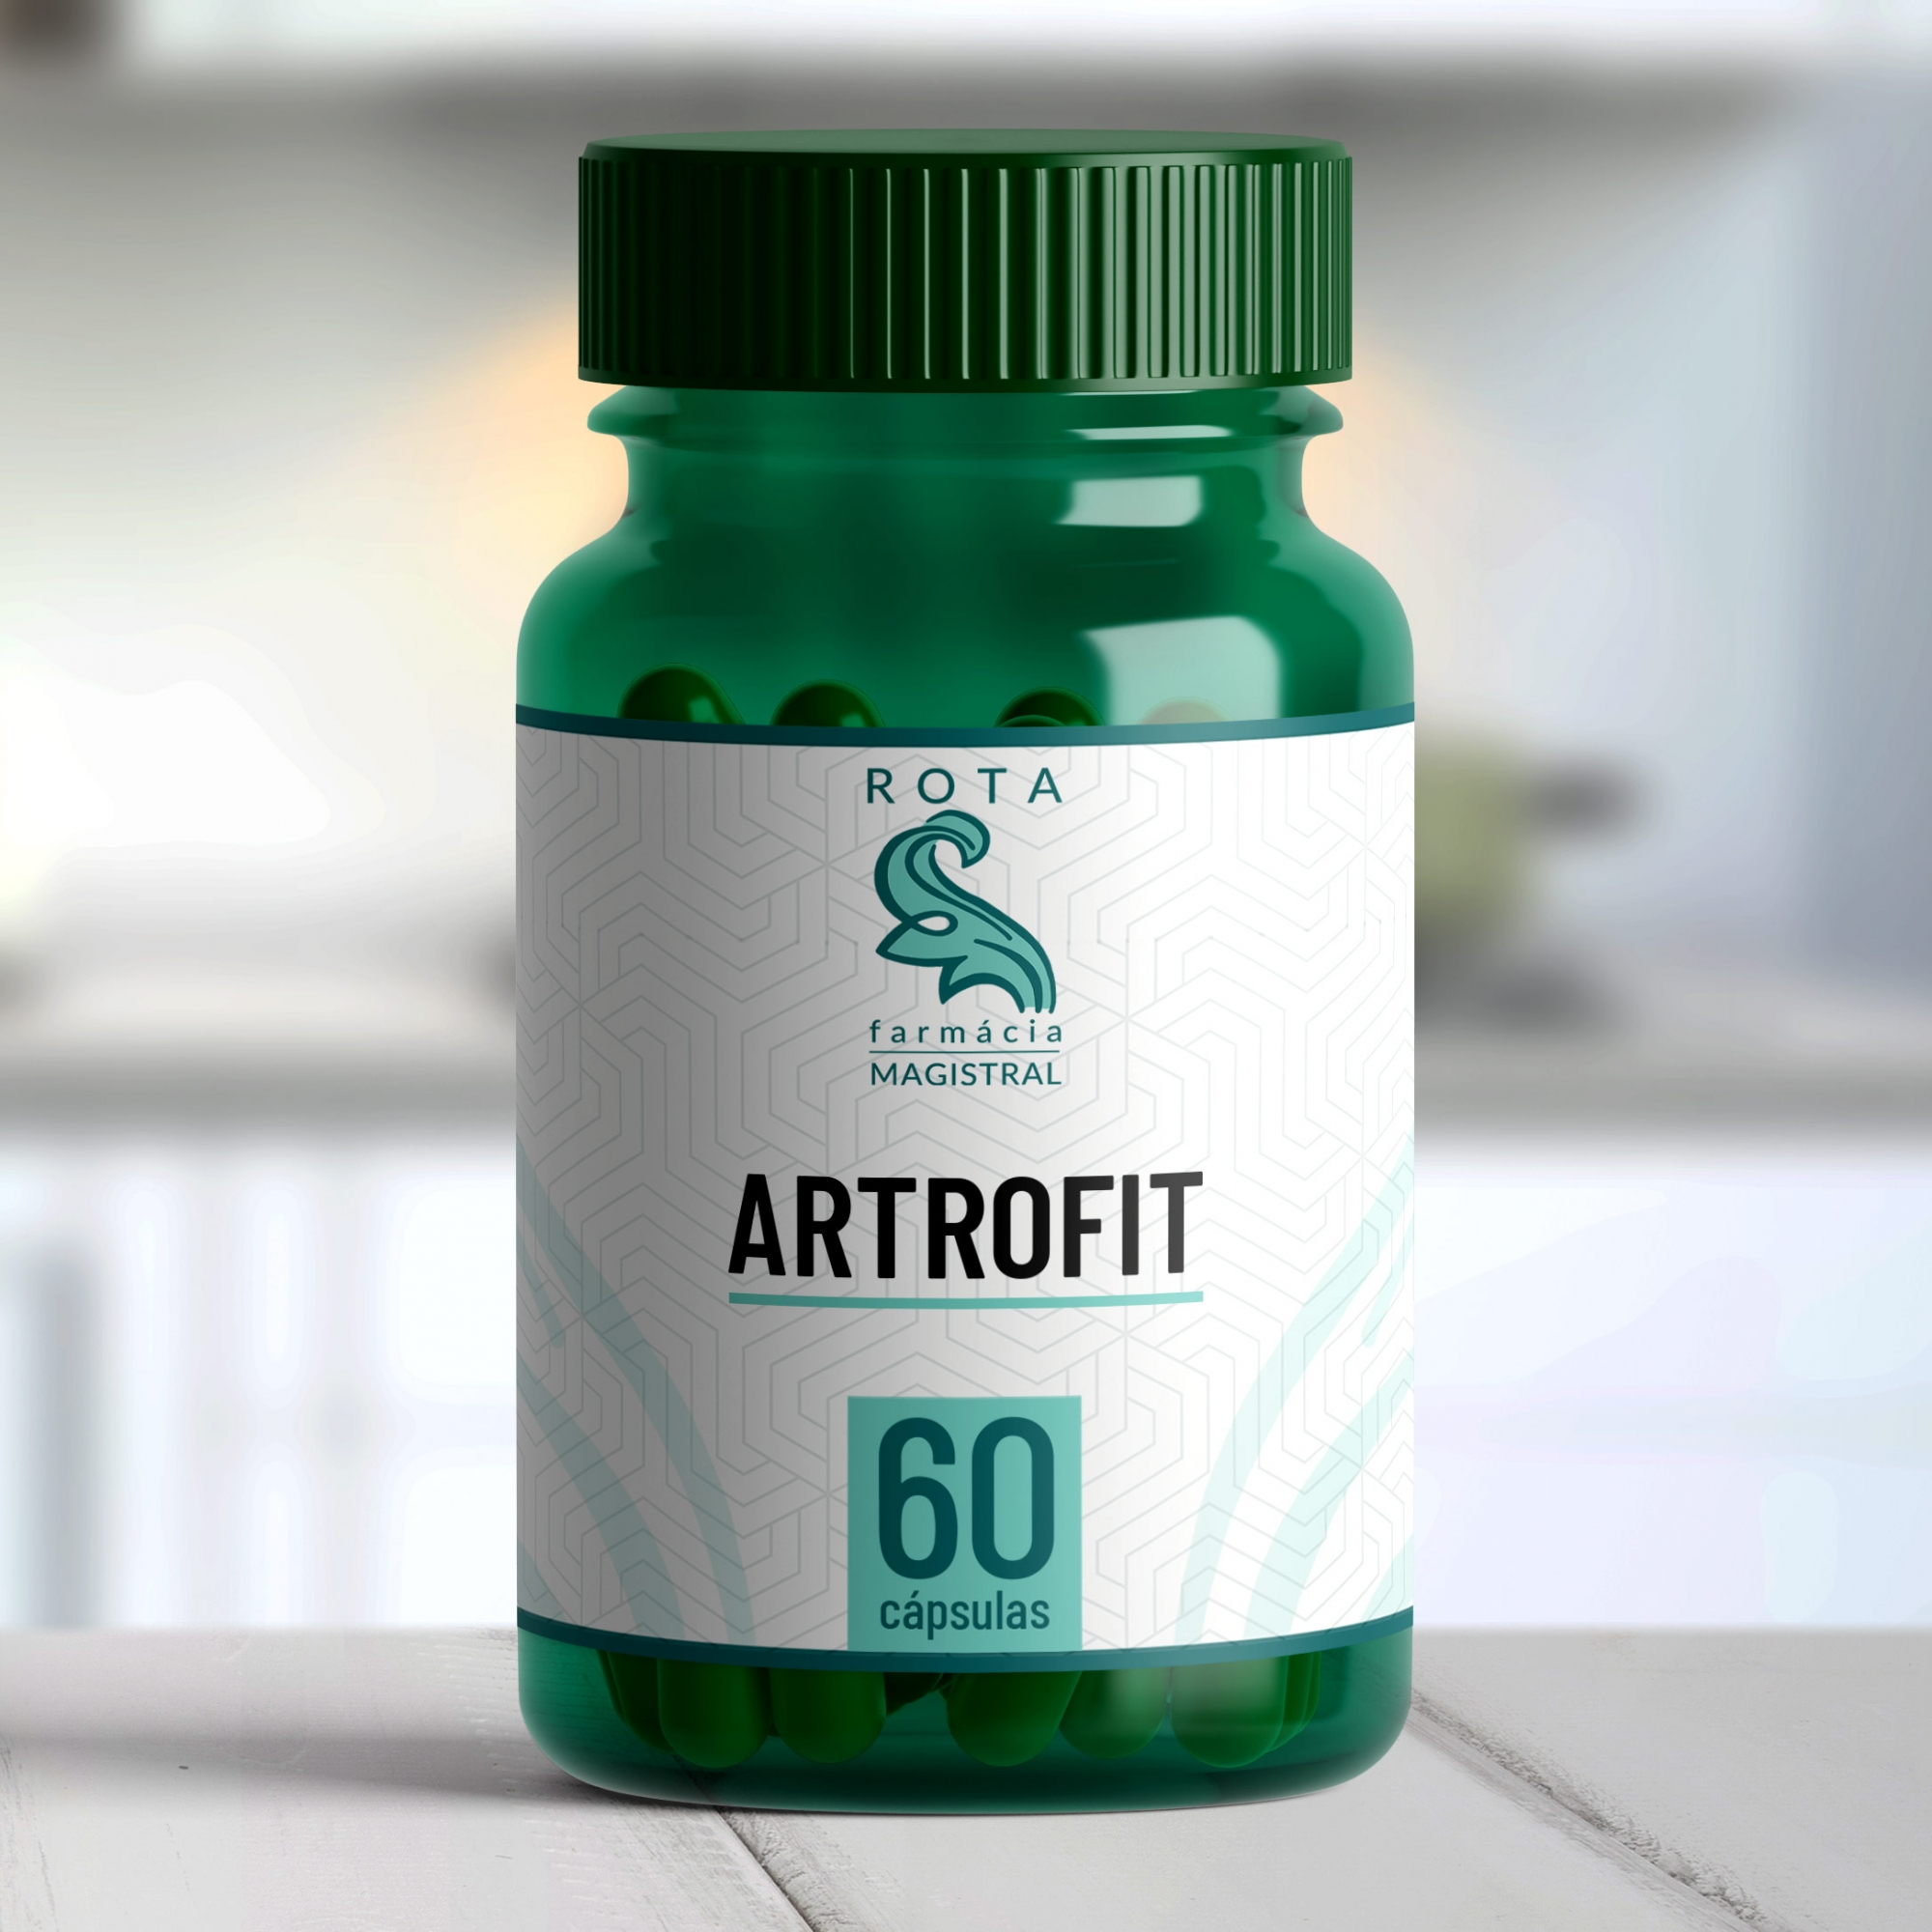 Artrofit 60 cápsulas